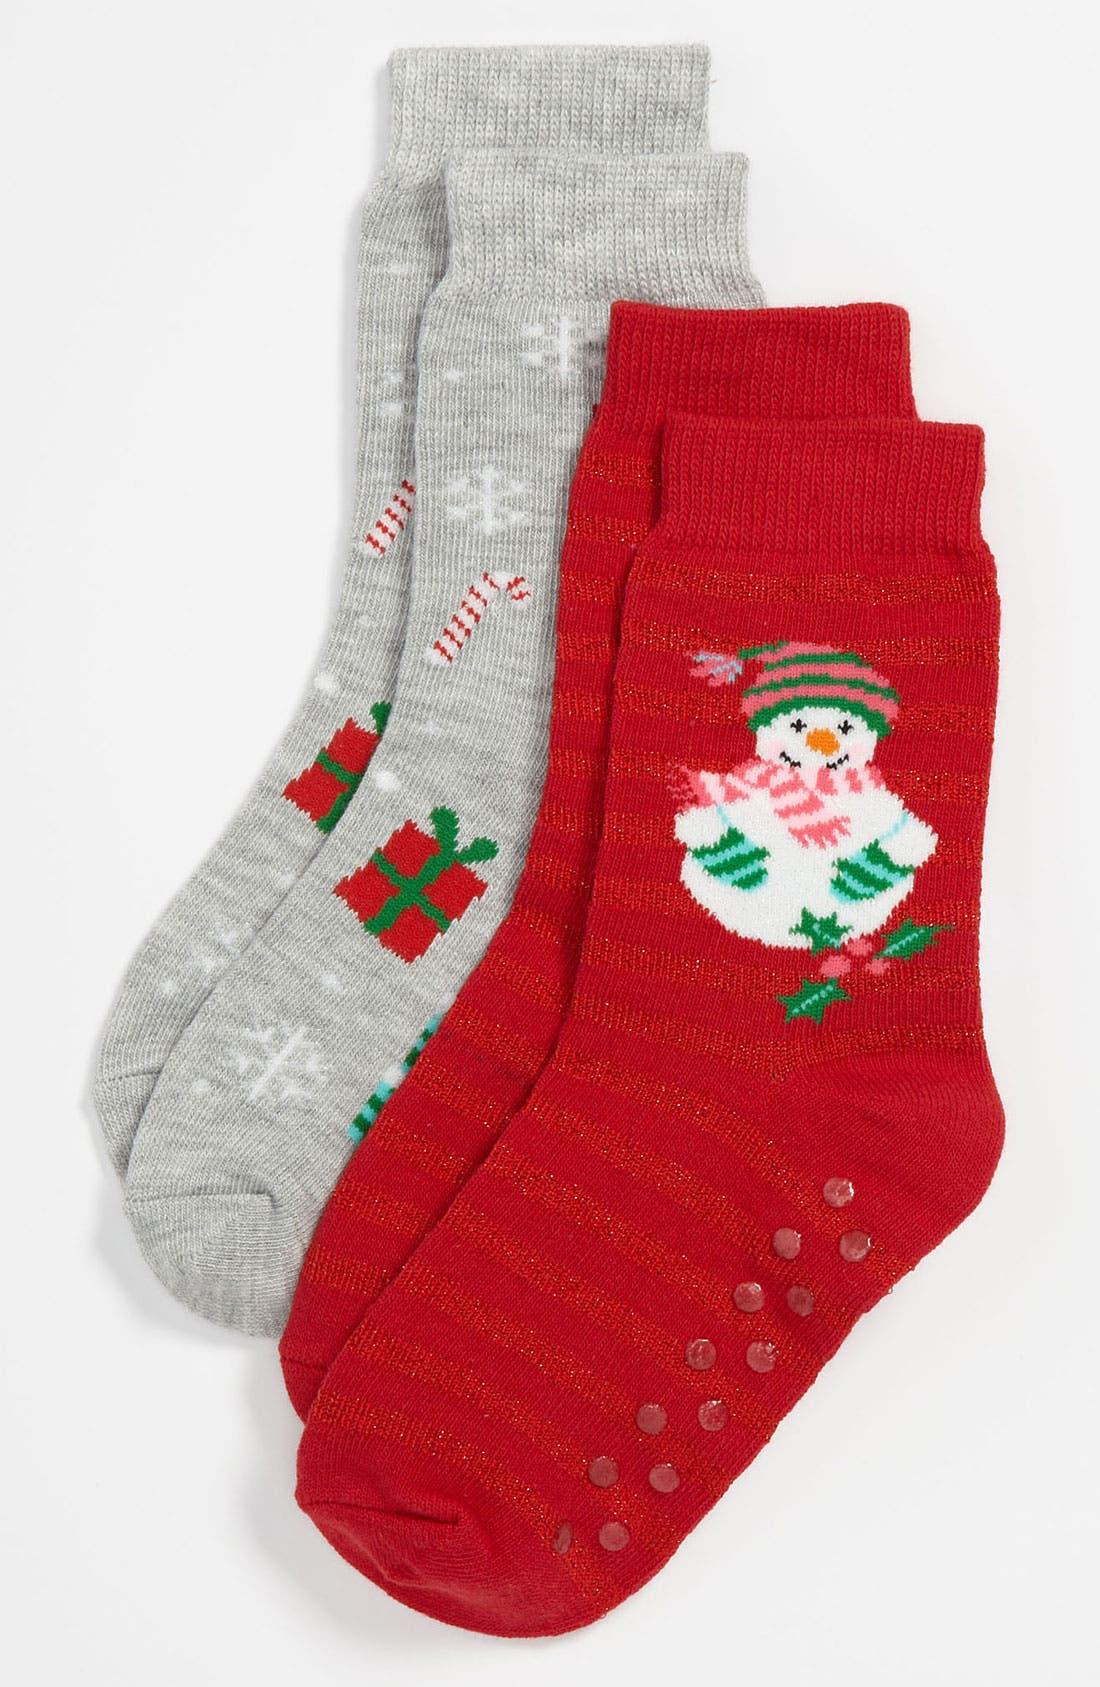 Main Image - Nordstrom 'Snowman' Socks (2-Pack) (Walker, Toddler, Little Kid & Big Kid)